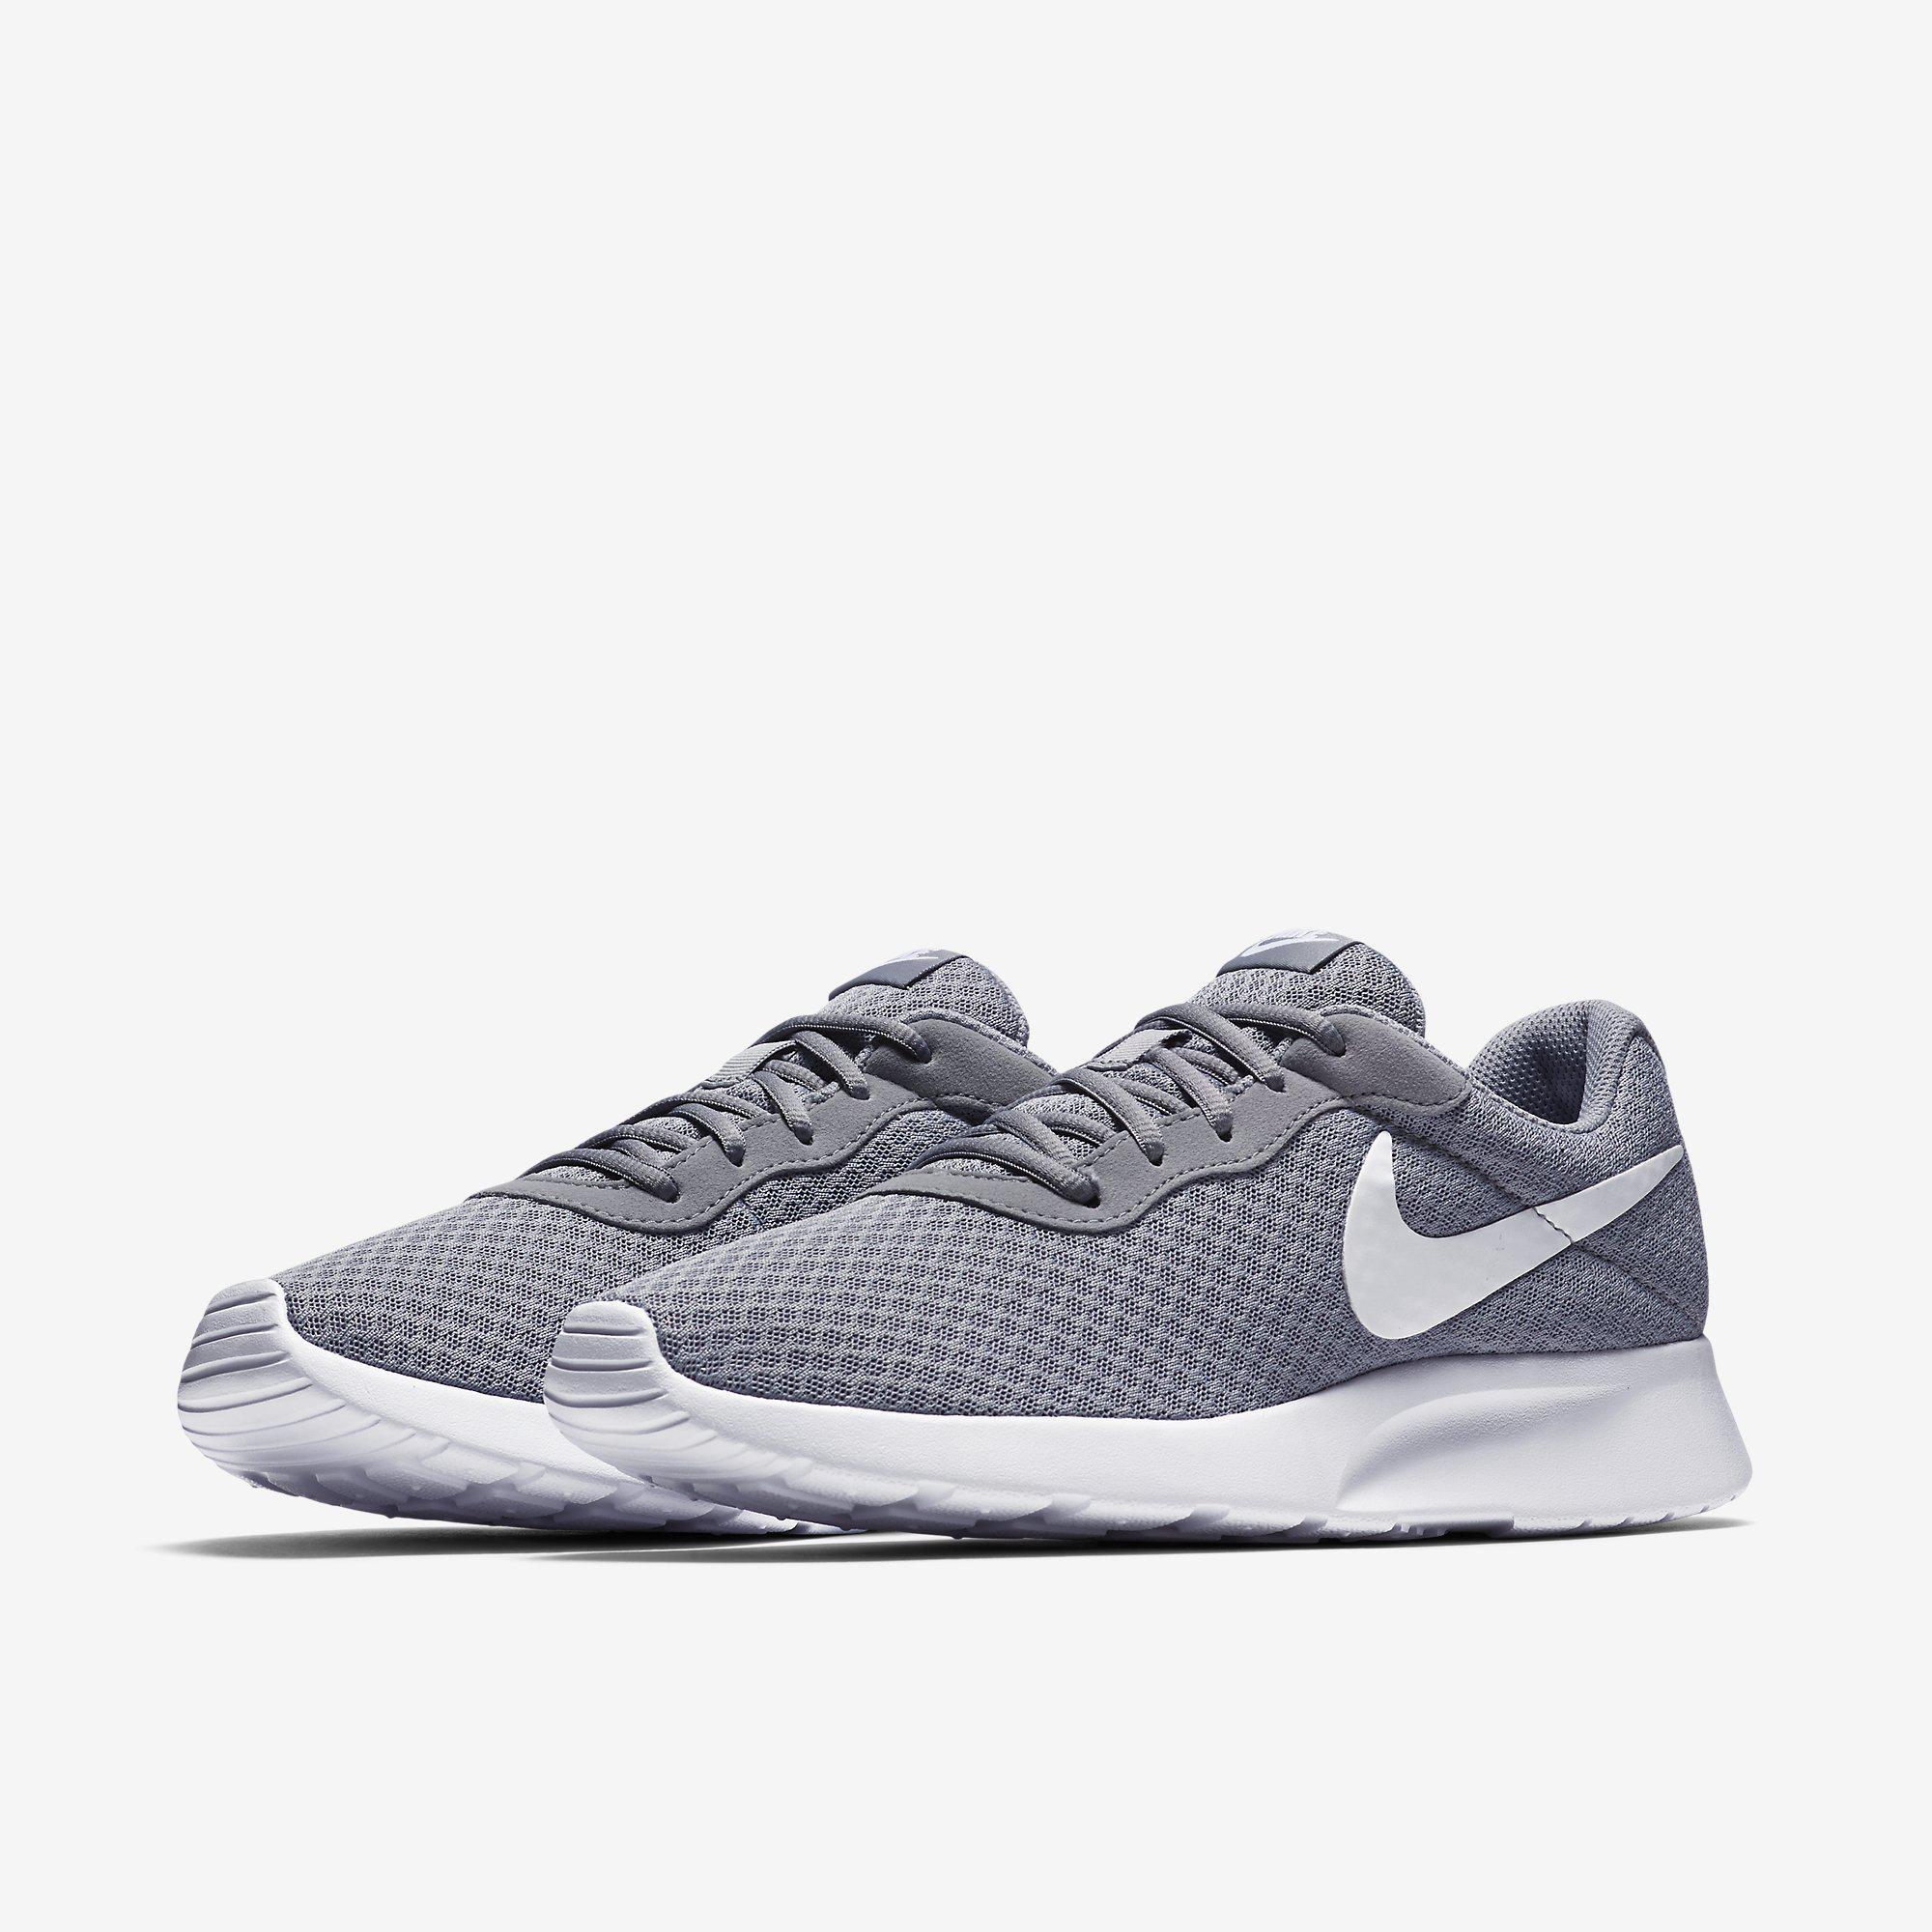 2ecb850dacc4 ... get nike mens tanjun running shoes wolf grey white 50d9d 12672